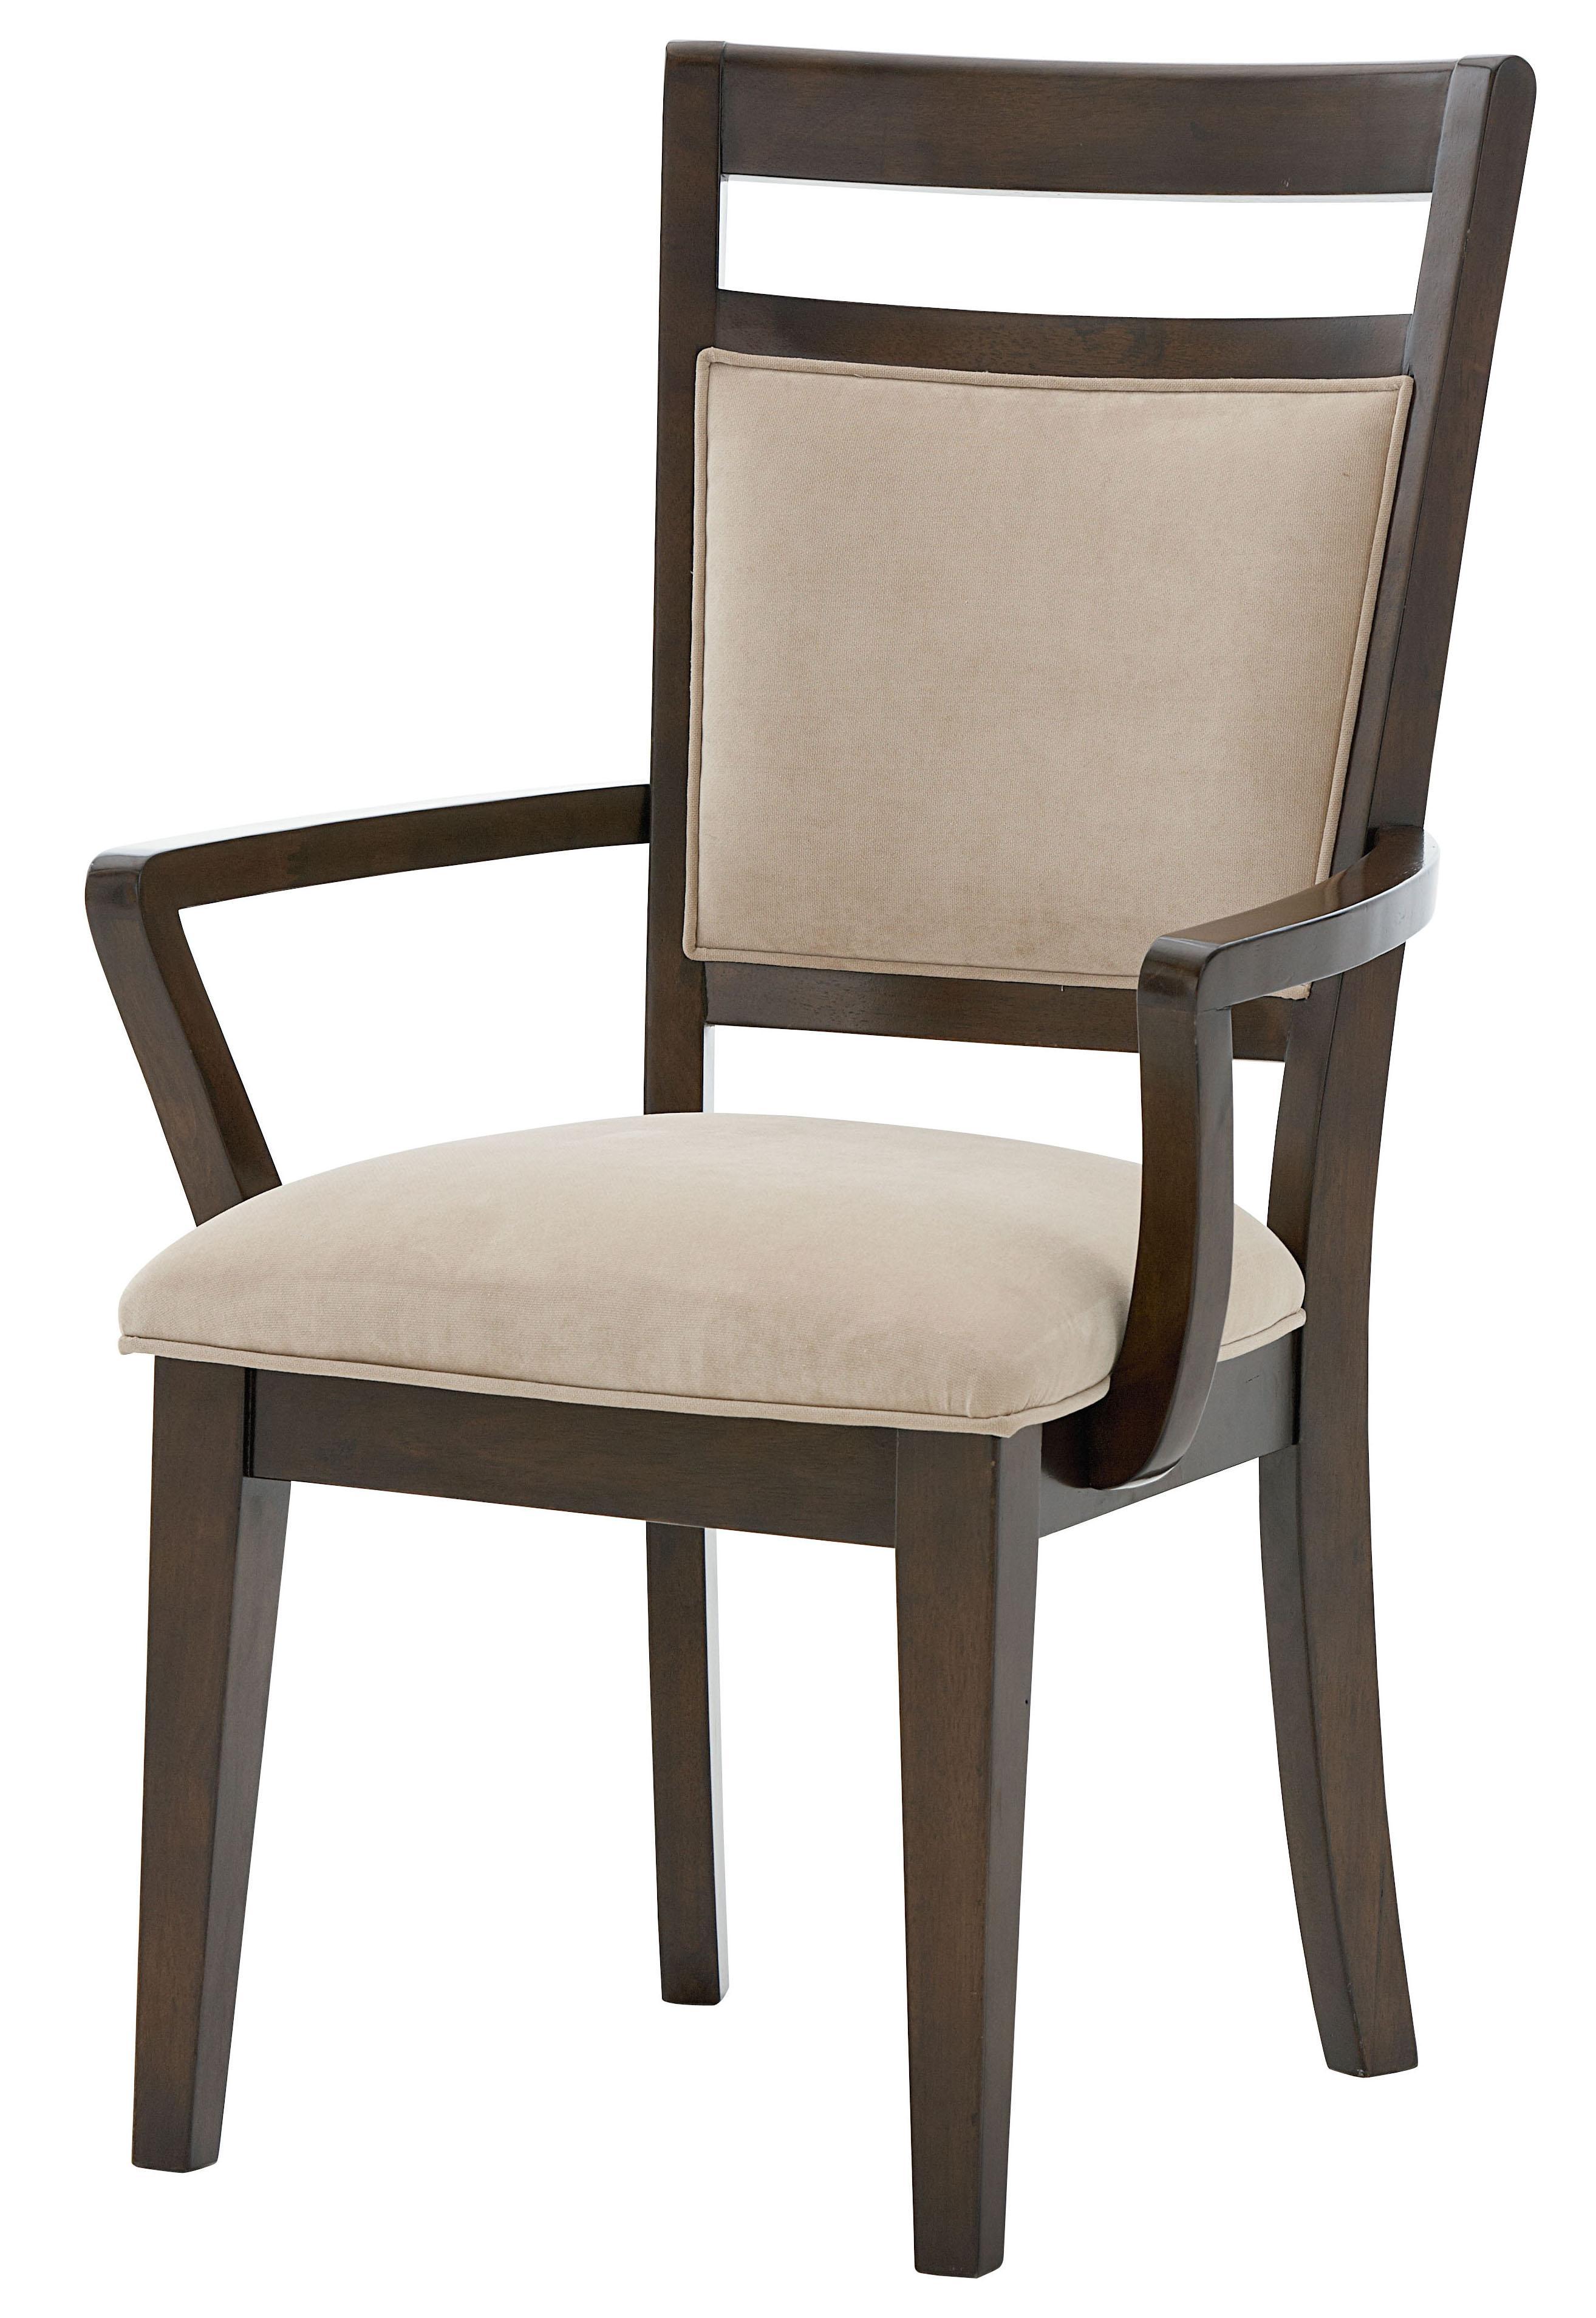 Standard Furniture Avion  Upholstered Arm Chair - Item Number: 17825